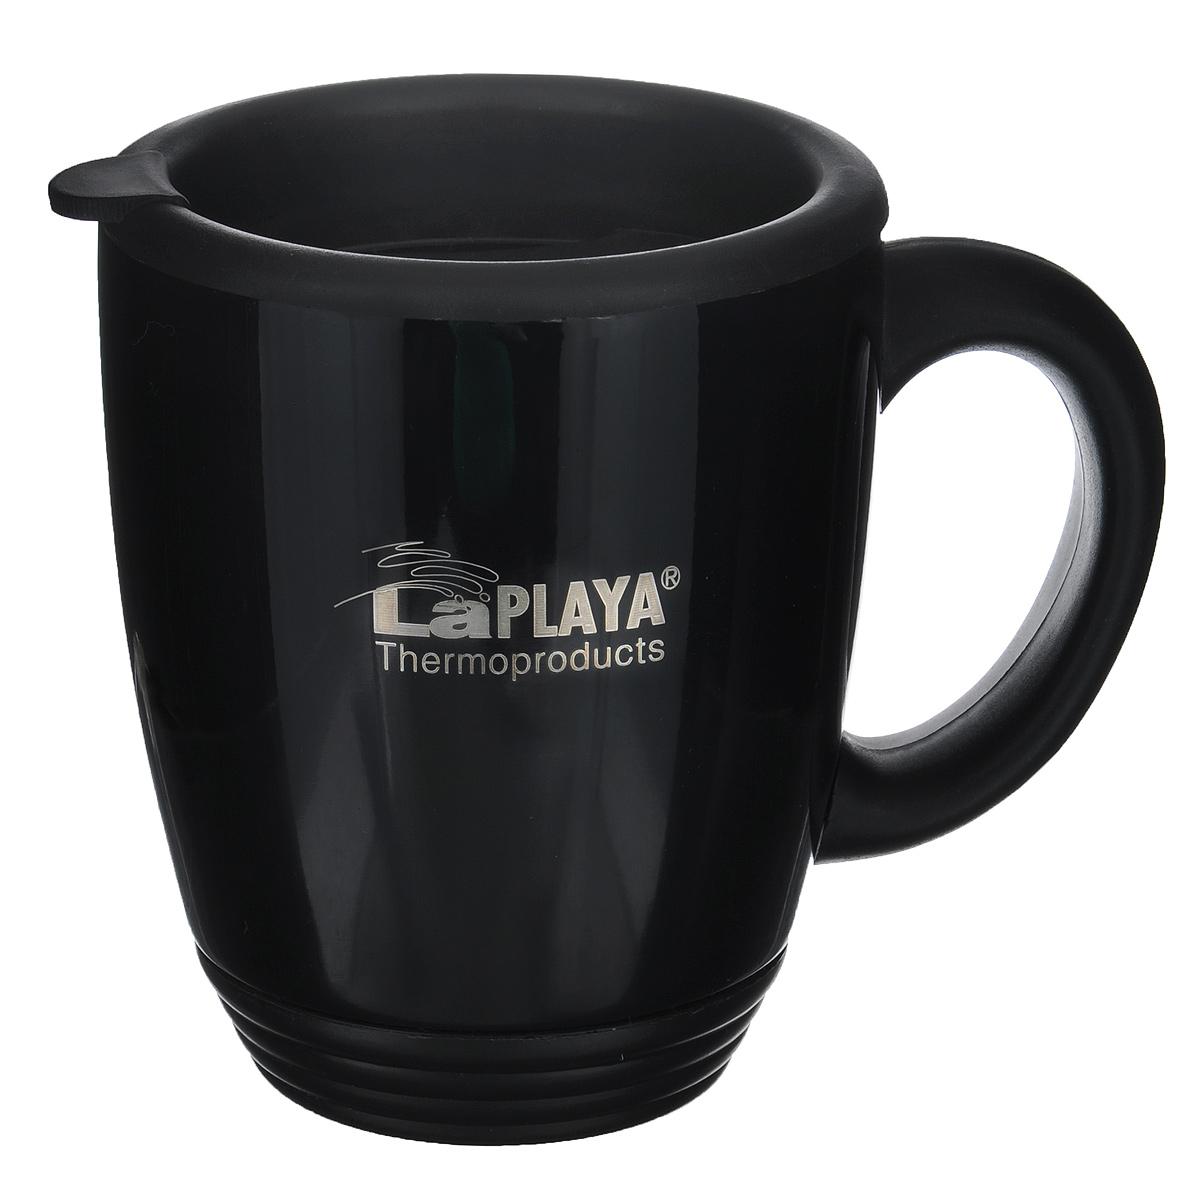 Термокружка LaPlaya, цвет: черный, 450 мл термокружка экспедиция натуралист 450 мл